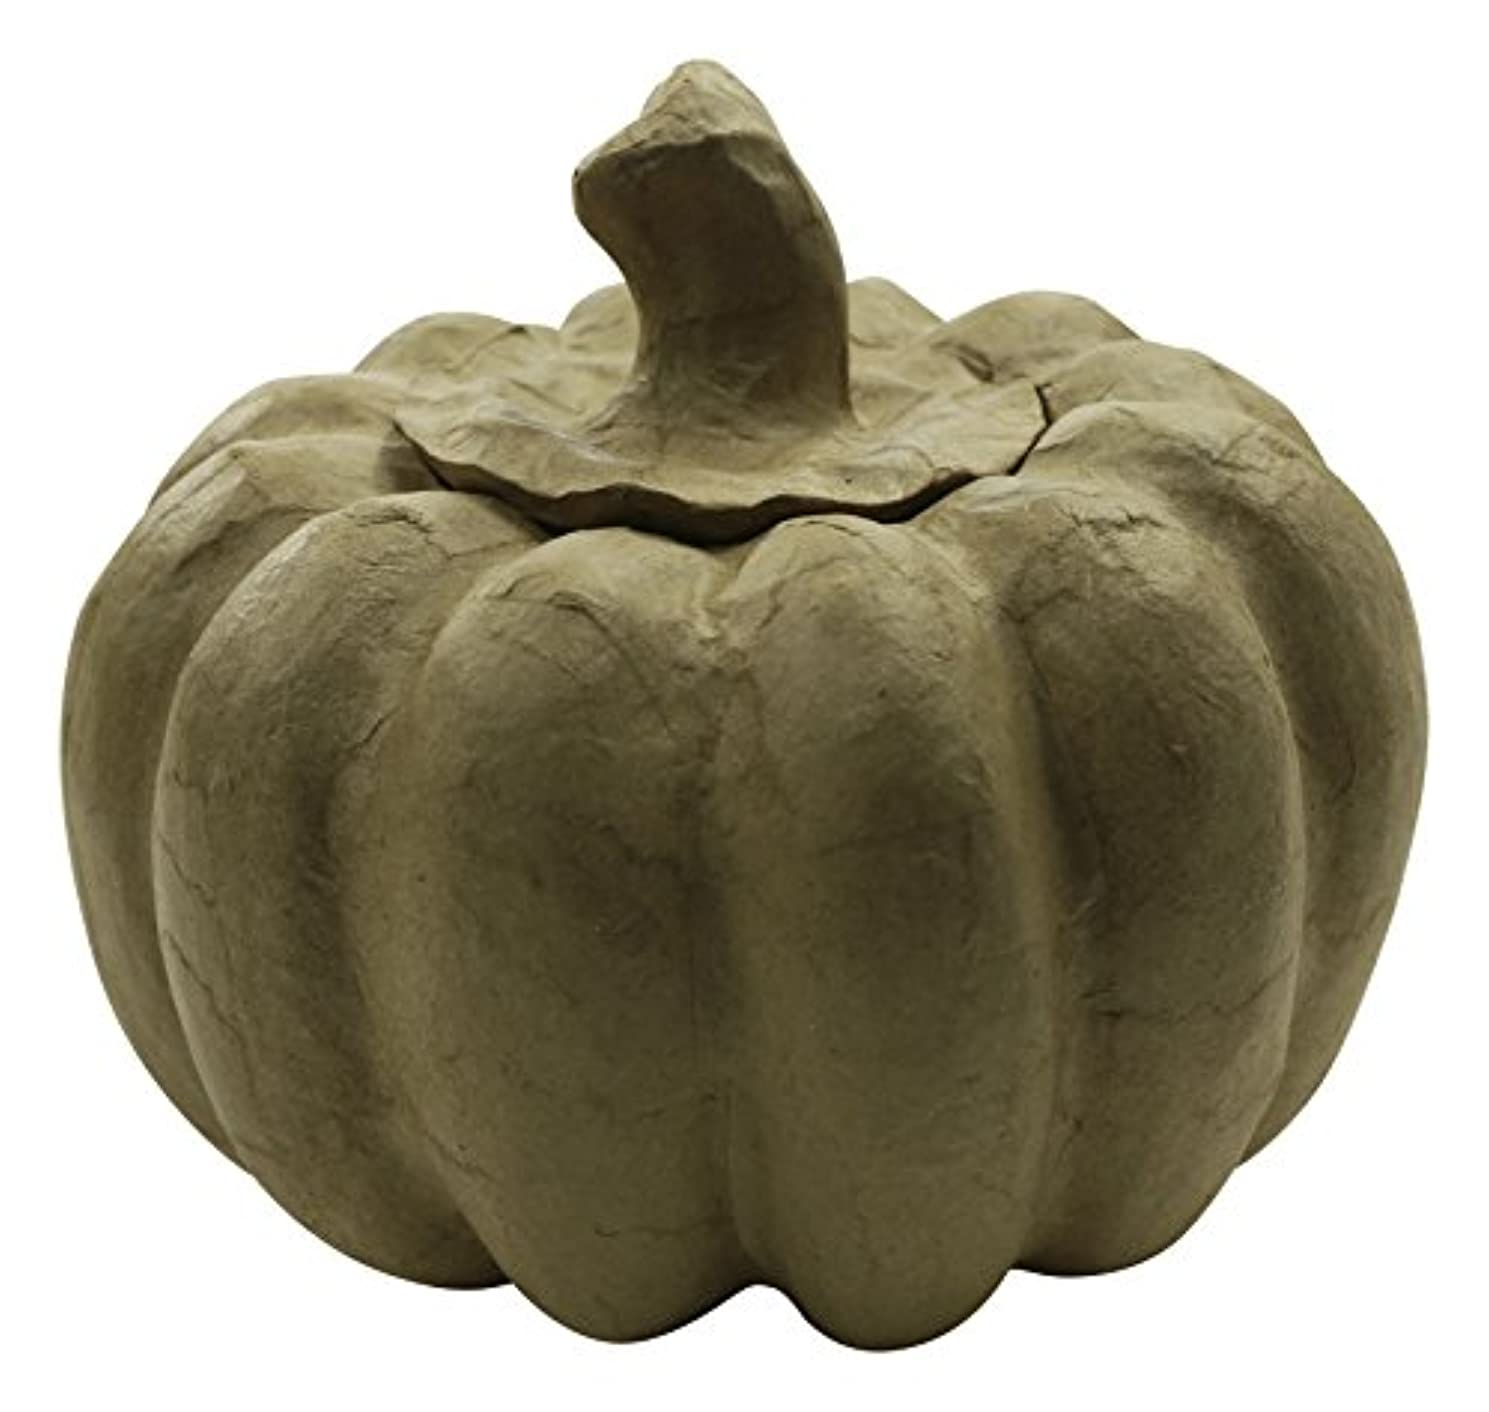 décopatch Mache Pumpkin, 15 x 15 x 13 cm, Brown